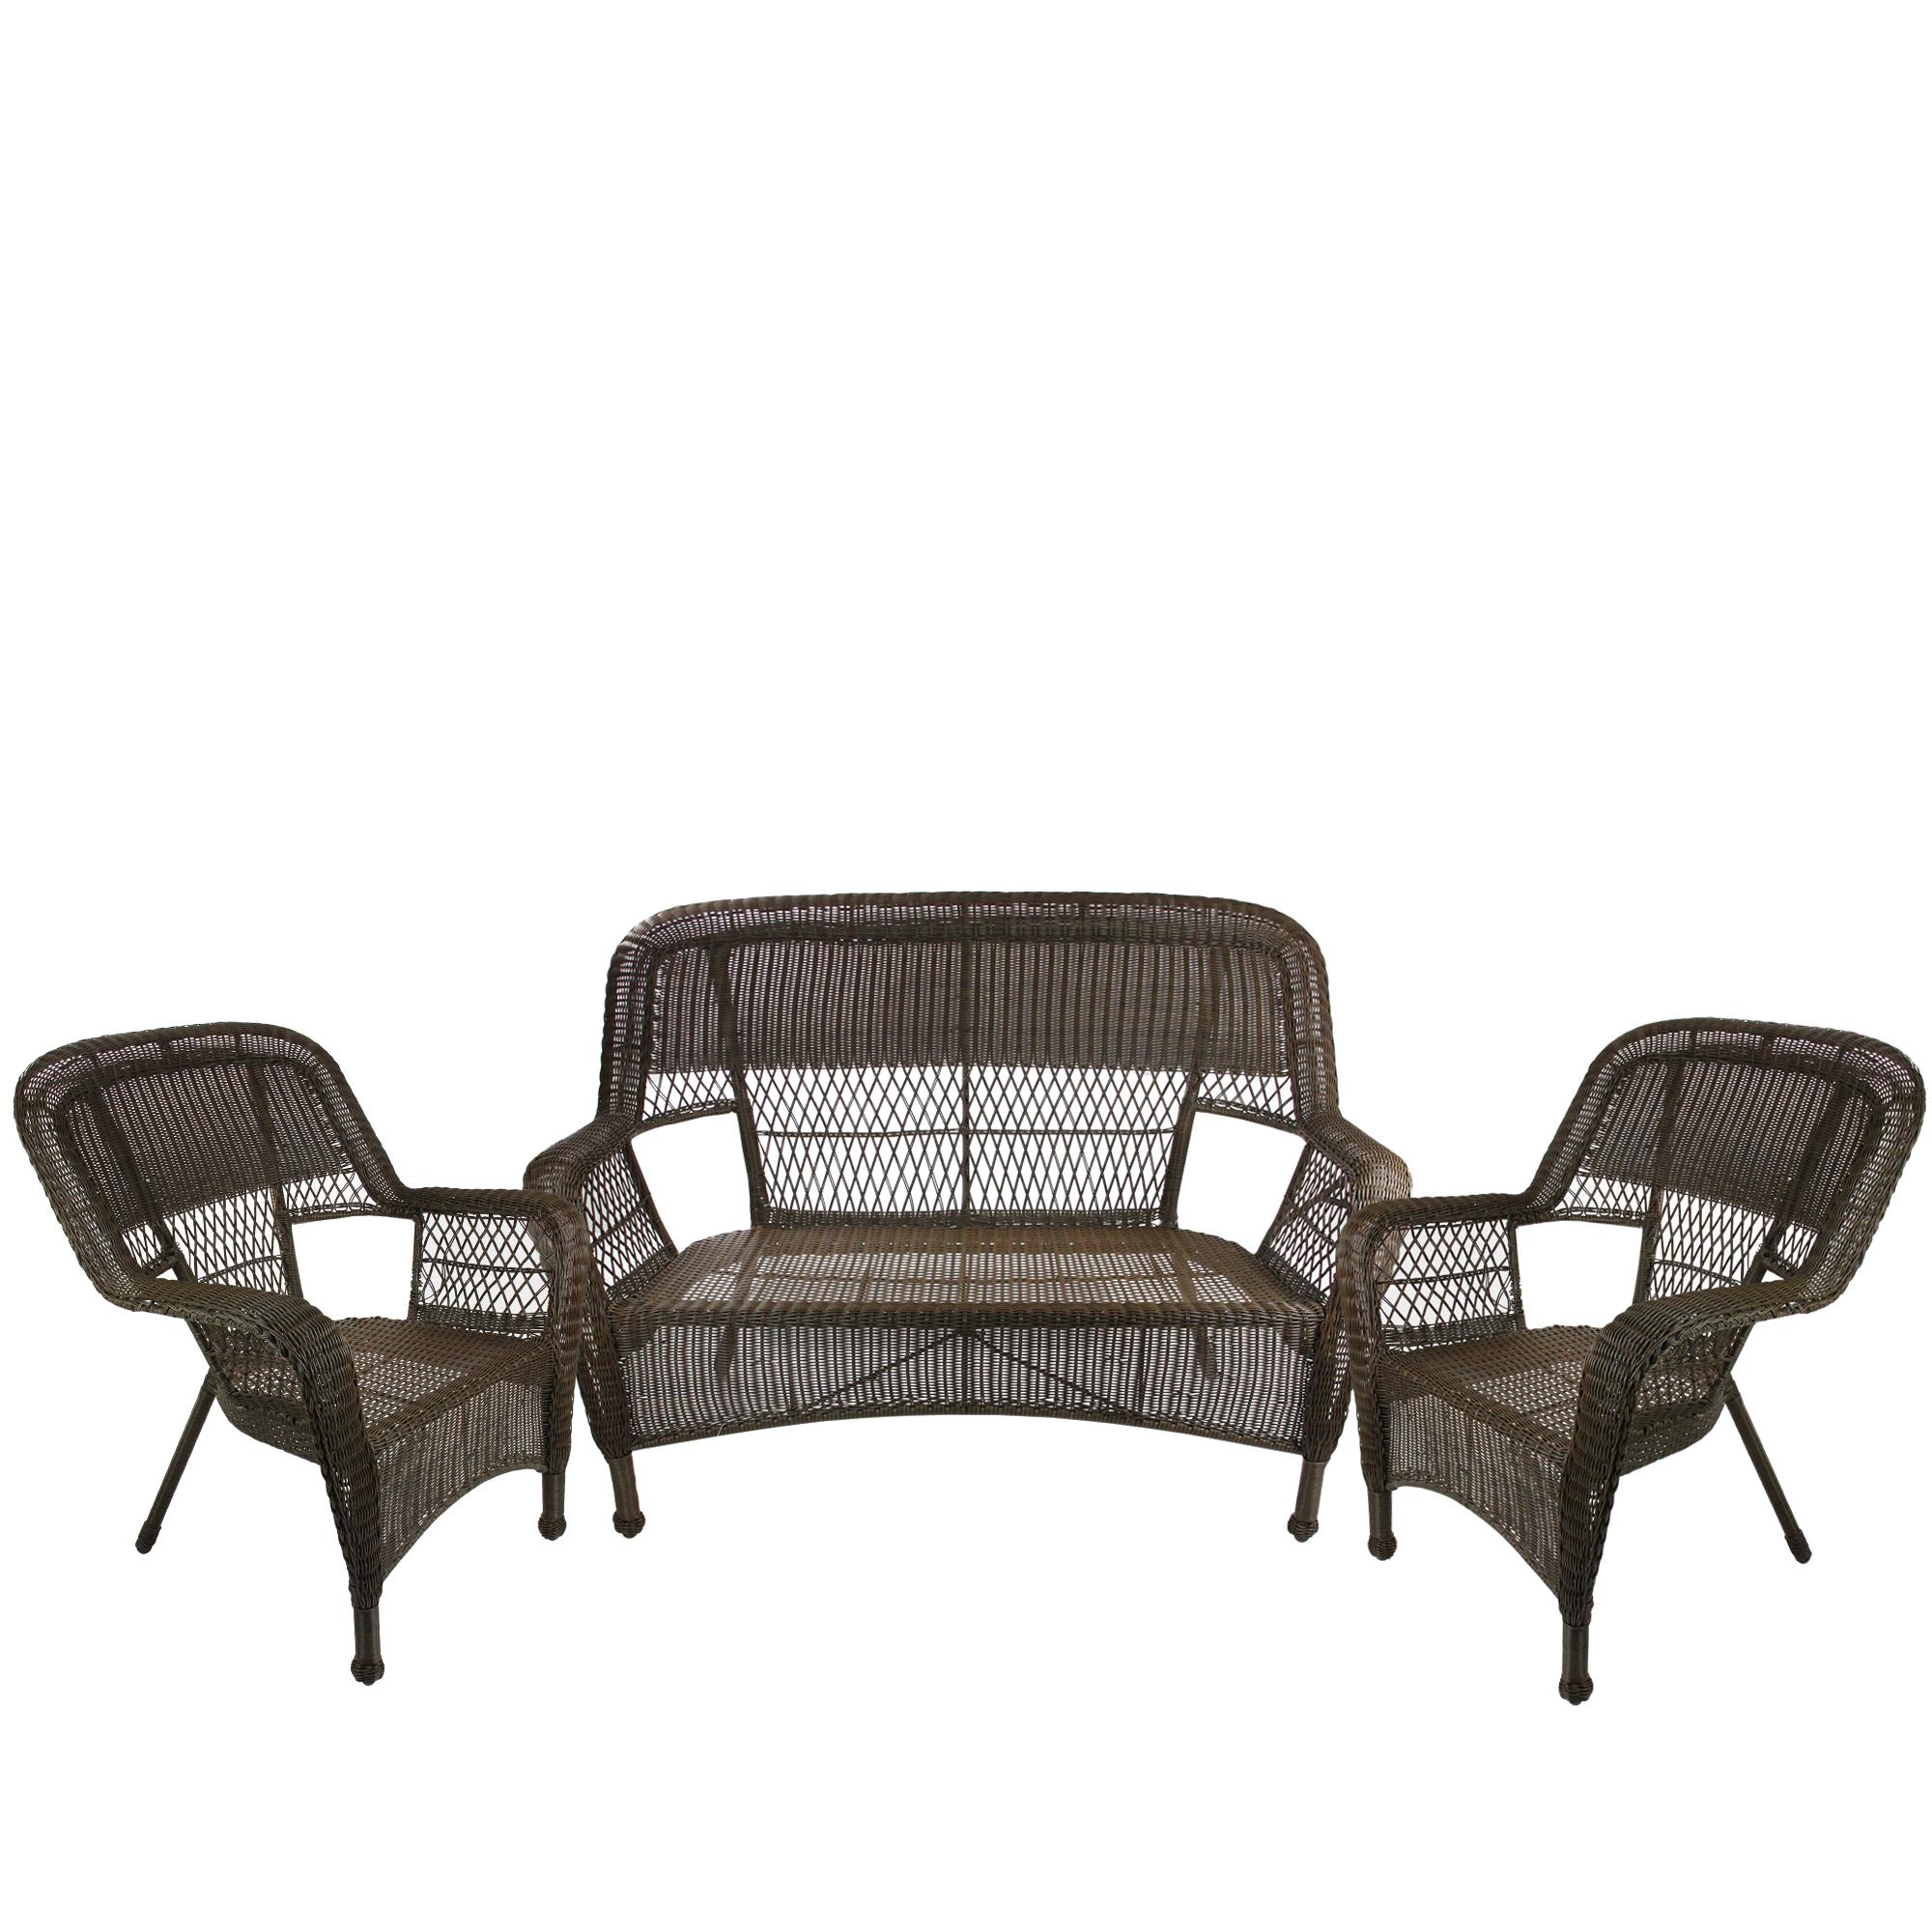 Northlight 4 Piece Brown Steel Resin Patio Furniture Set Loveseat 2